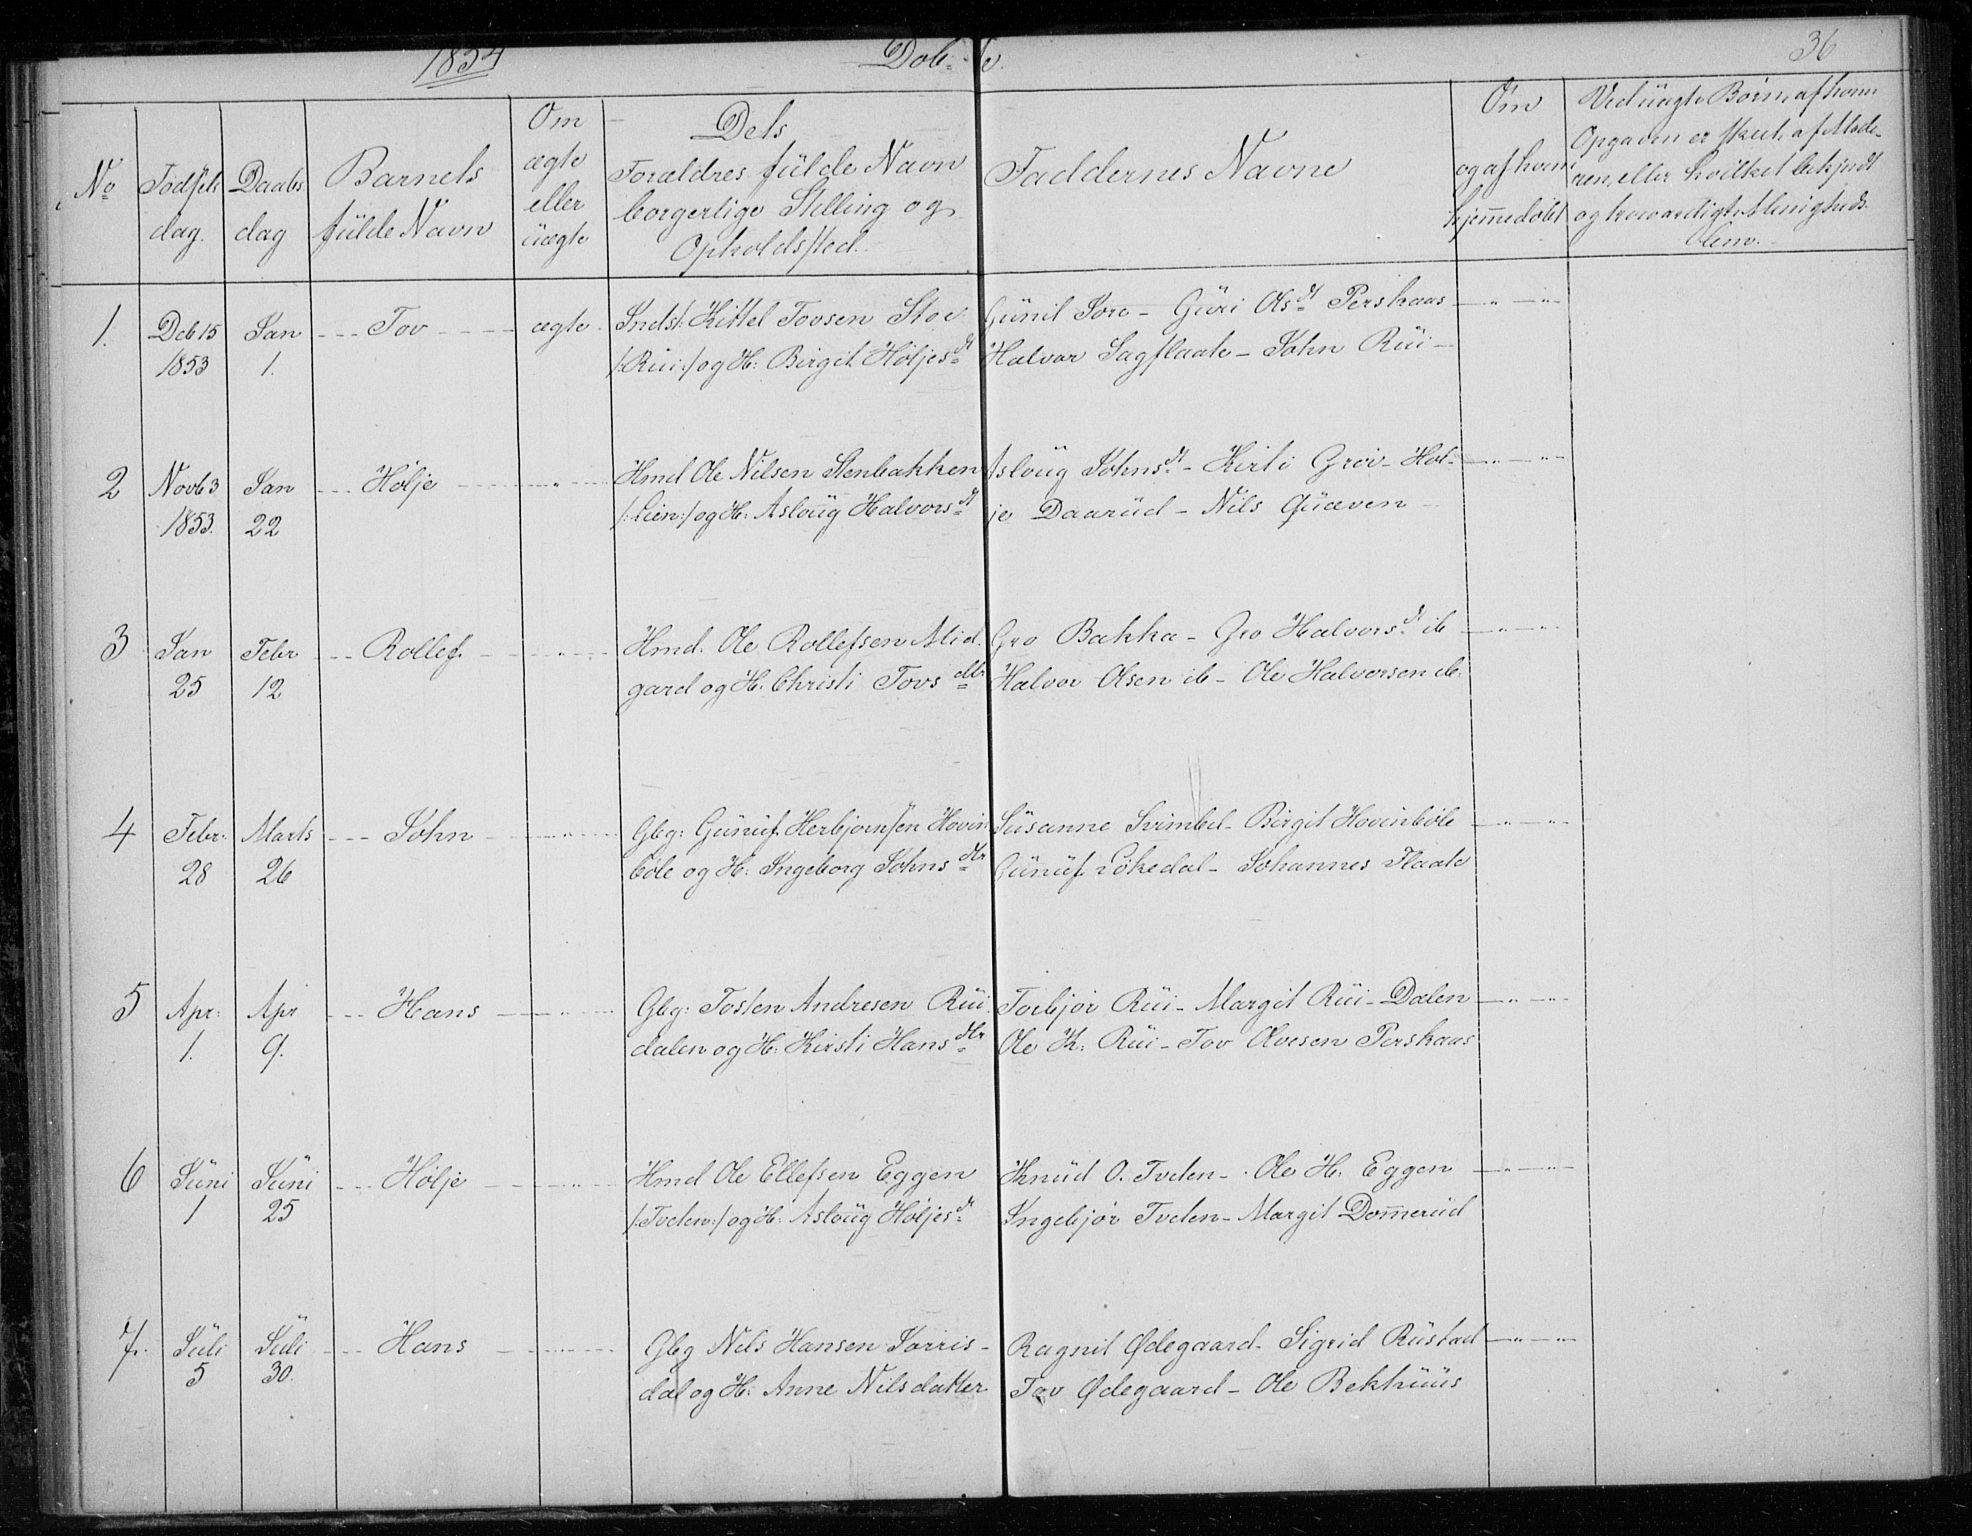 SAKO, Gransherad kirkebøker, F/Fb/L0003: Ministerialbok nr. II 3, 1844-1859, s. 36